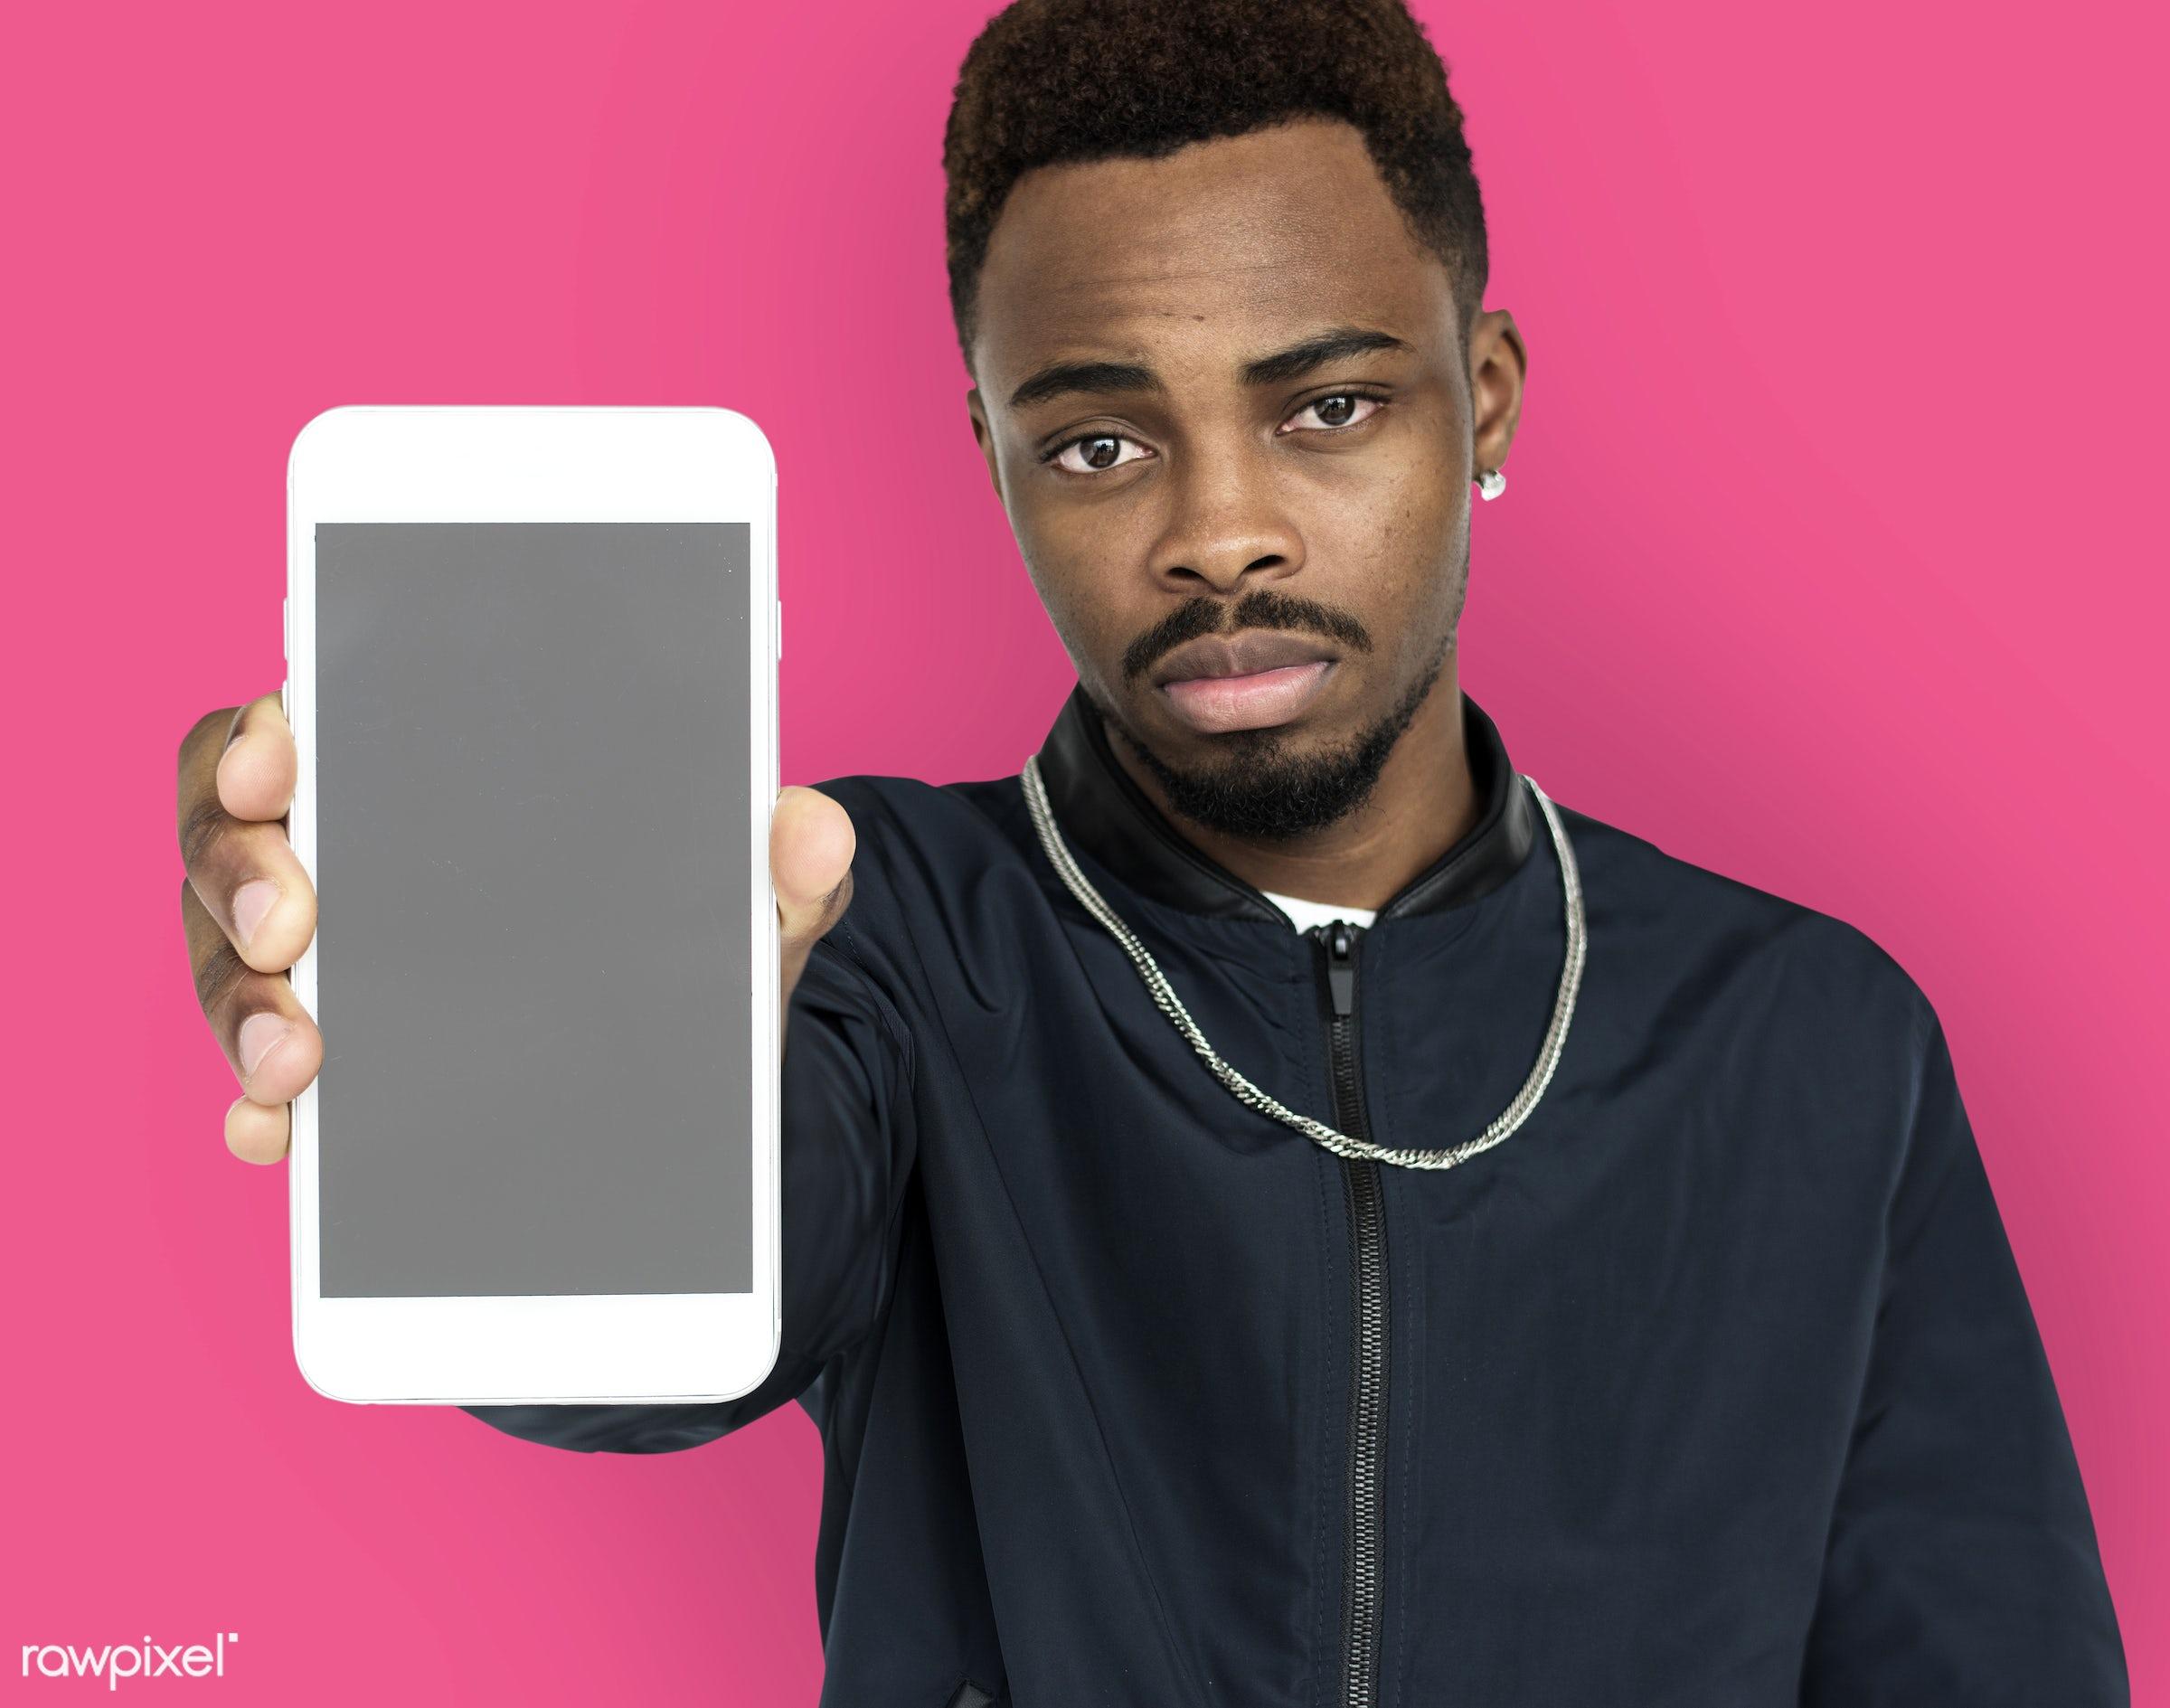 african descent, background, beard, black, communication, device, emotion, expression, focused, holding, holding phone,...